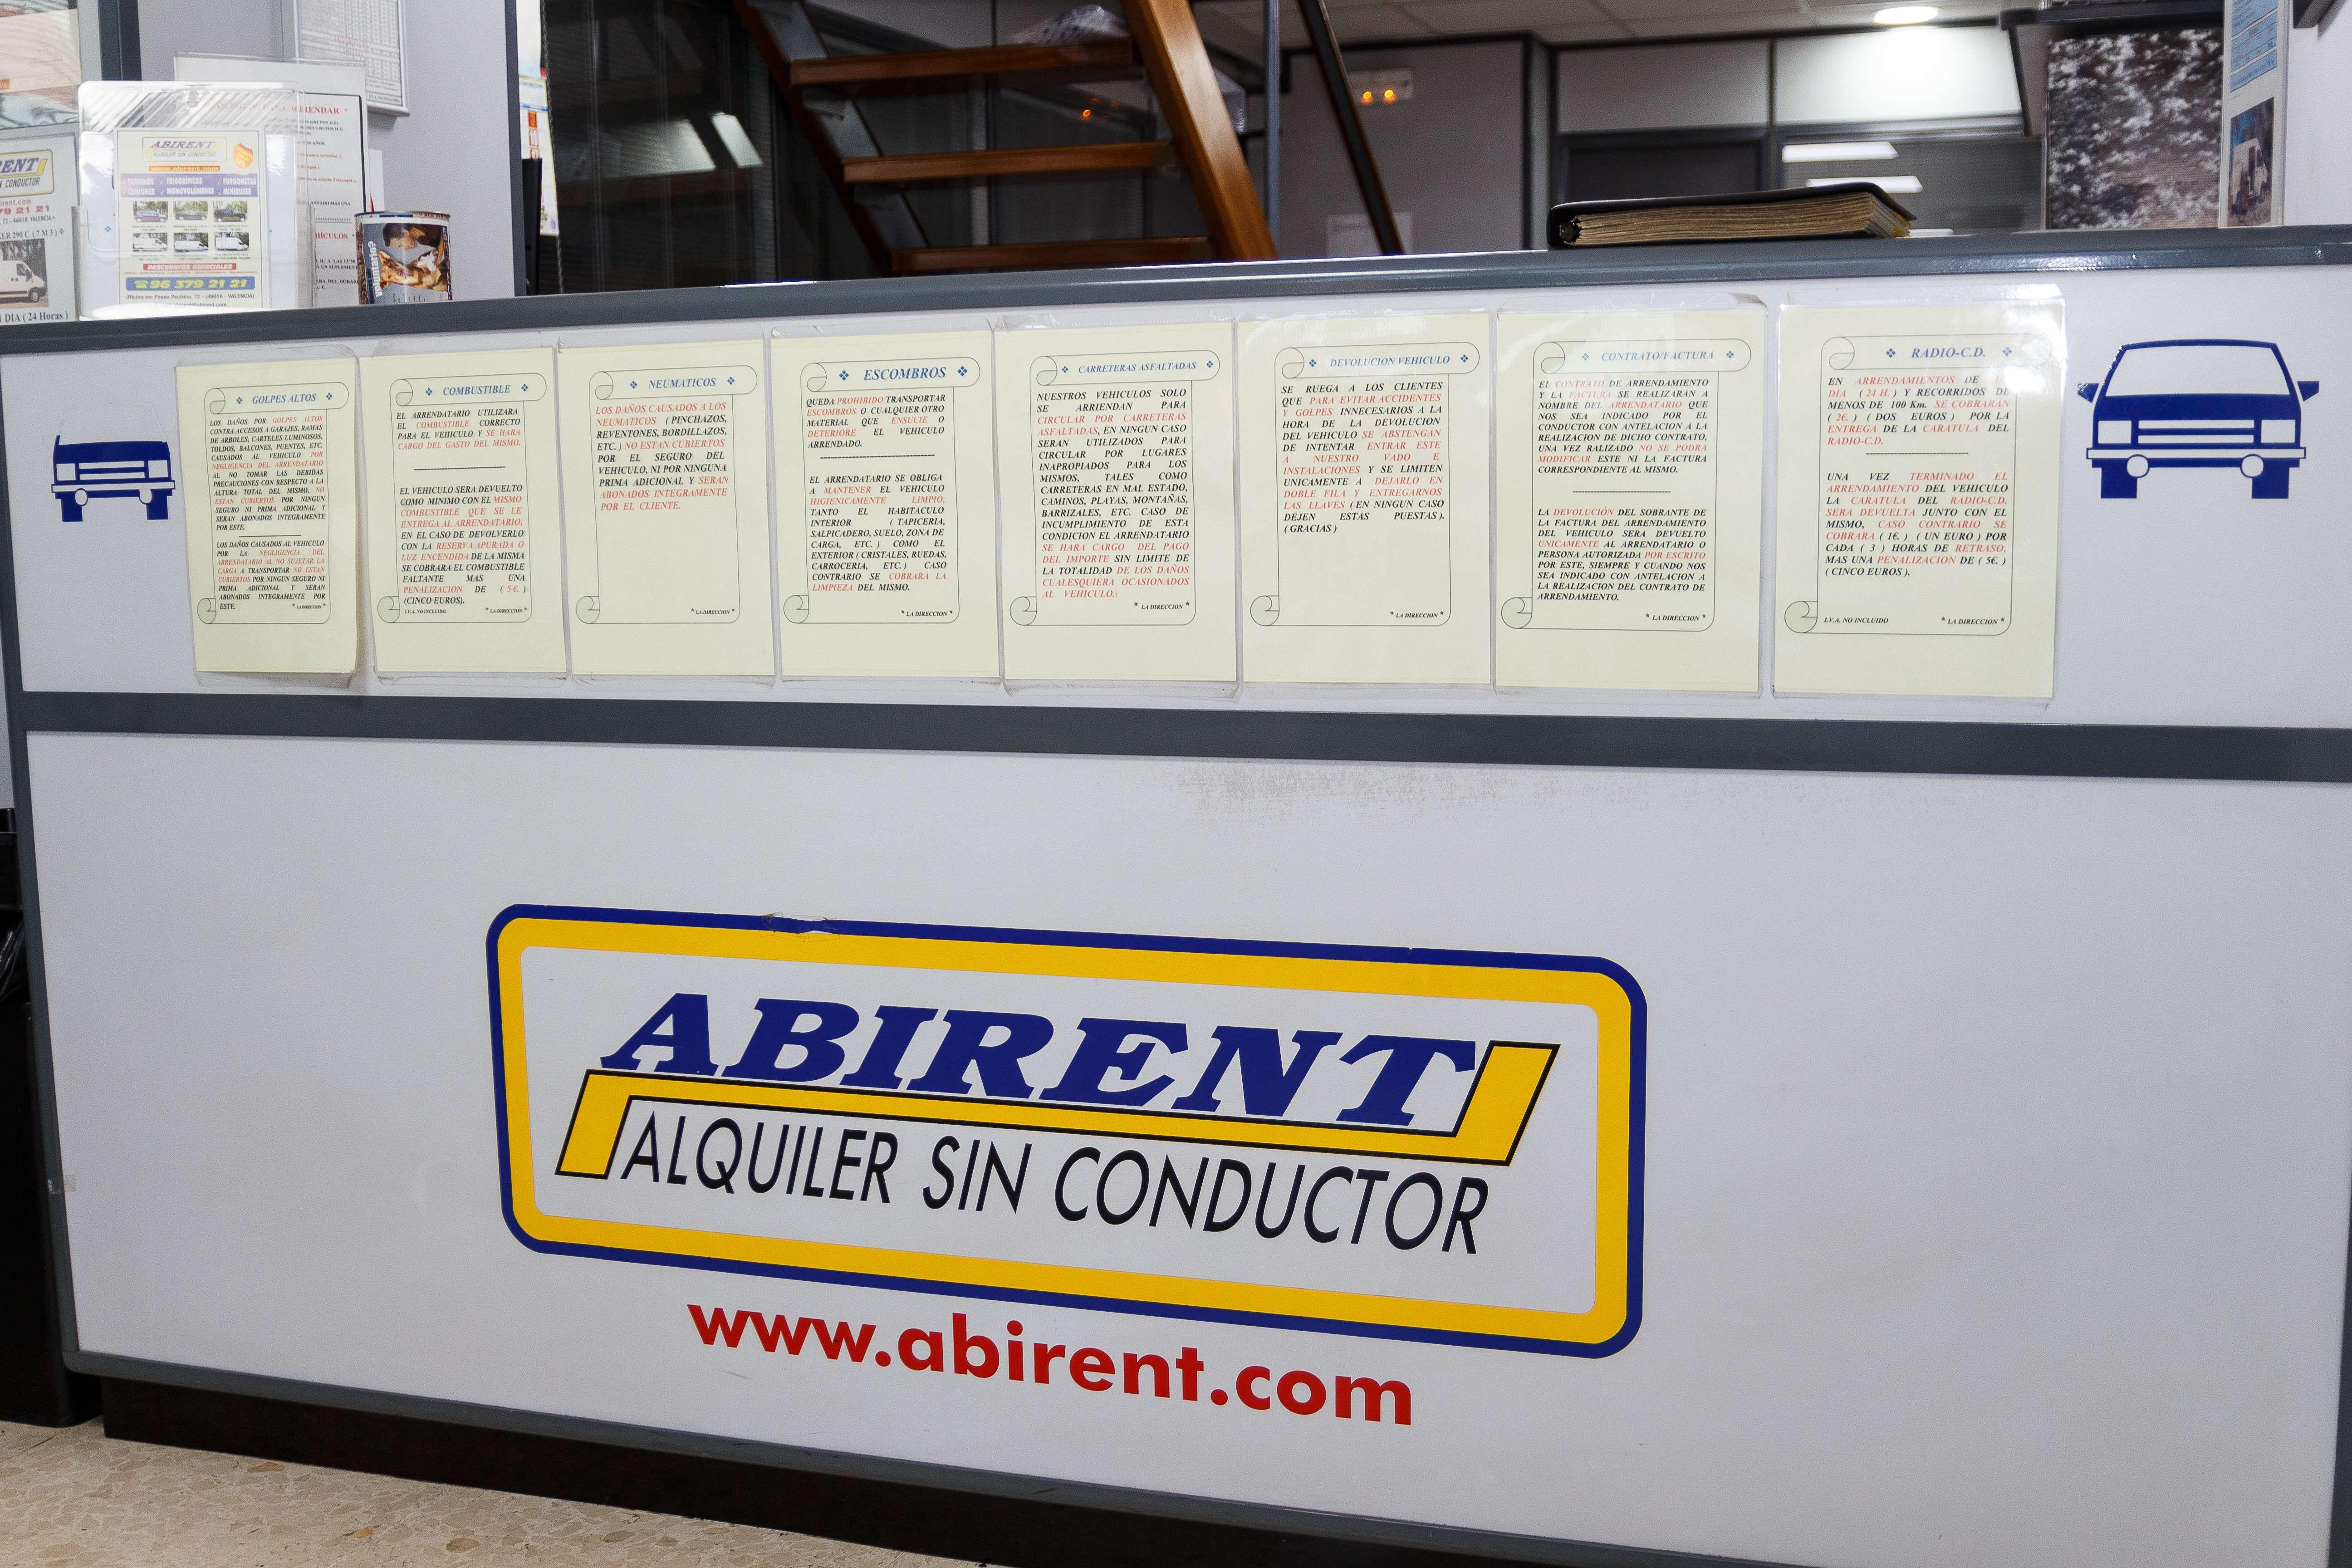 Alquiler de microbuses en Valencia